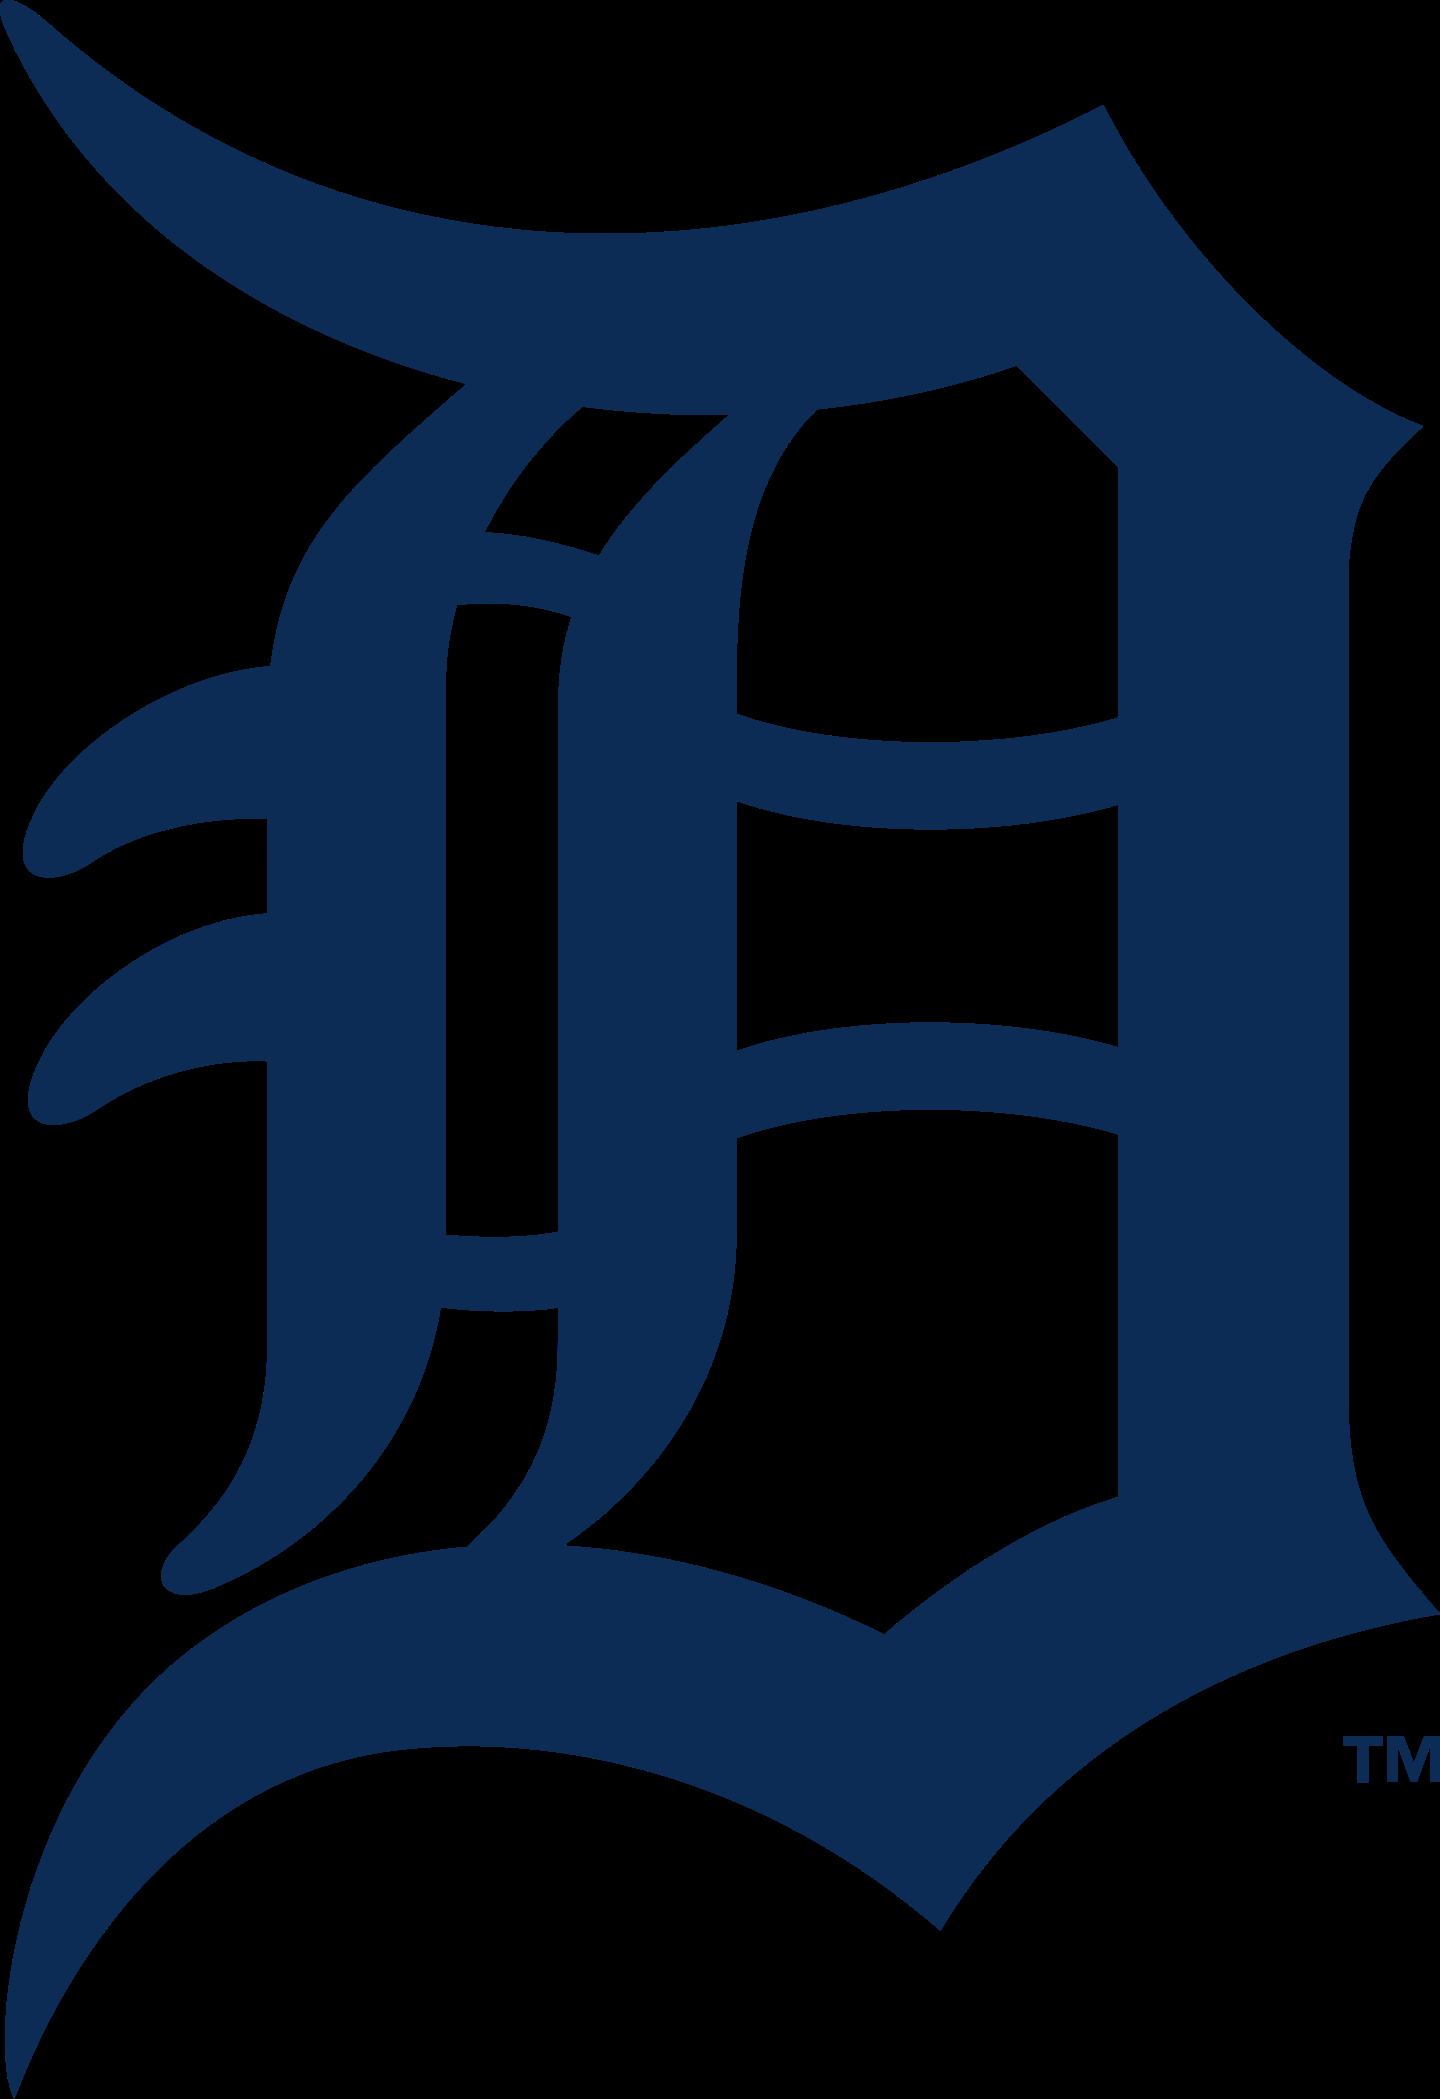 detroit tigers logo 2 - Detroit Tigers Logo